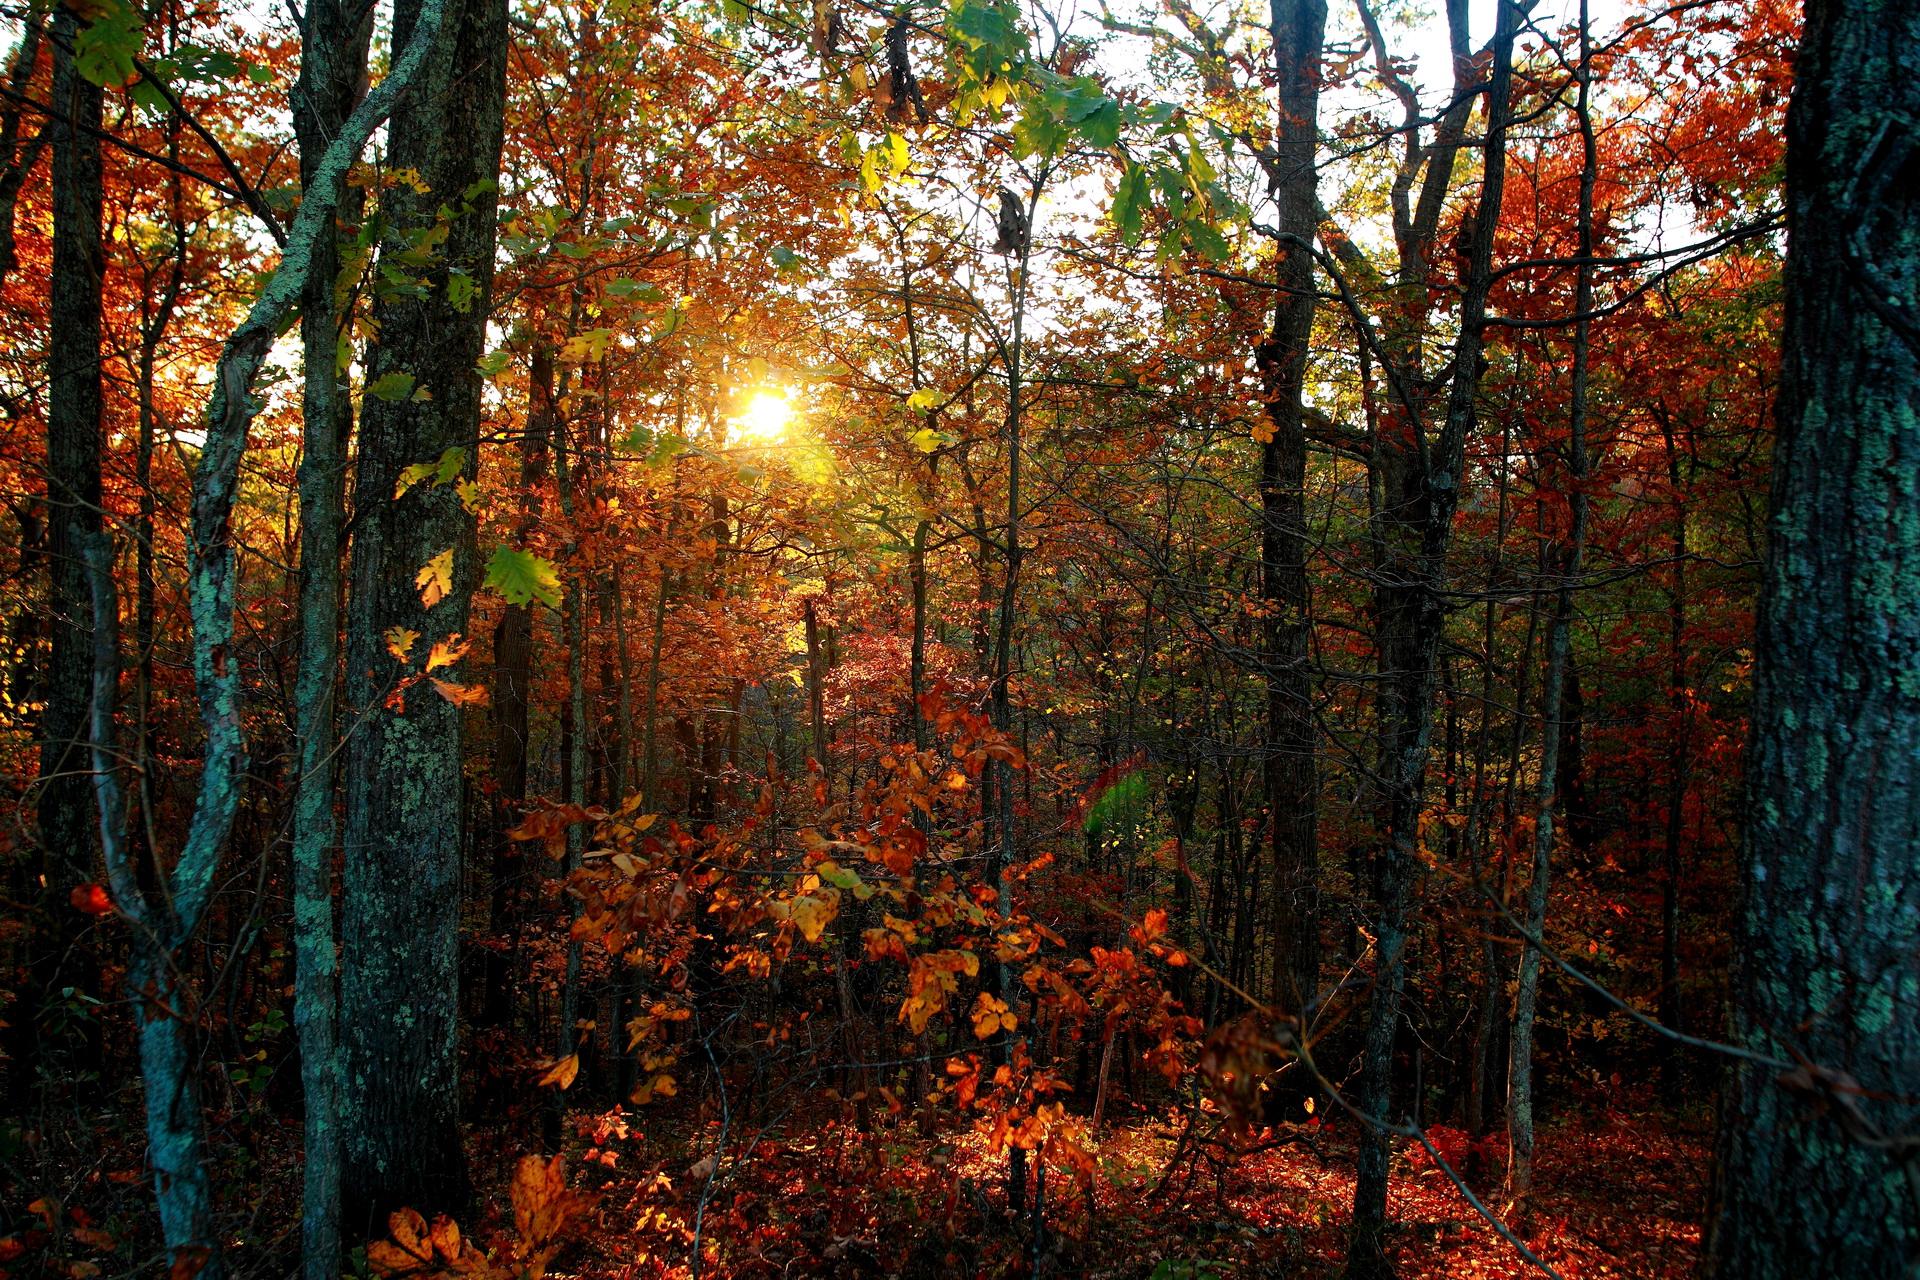 Gloomy Fall Wallpaper West Virginia By Forestwander Com Desktop Wallpaper